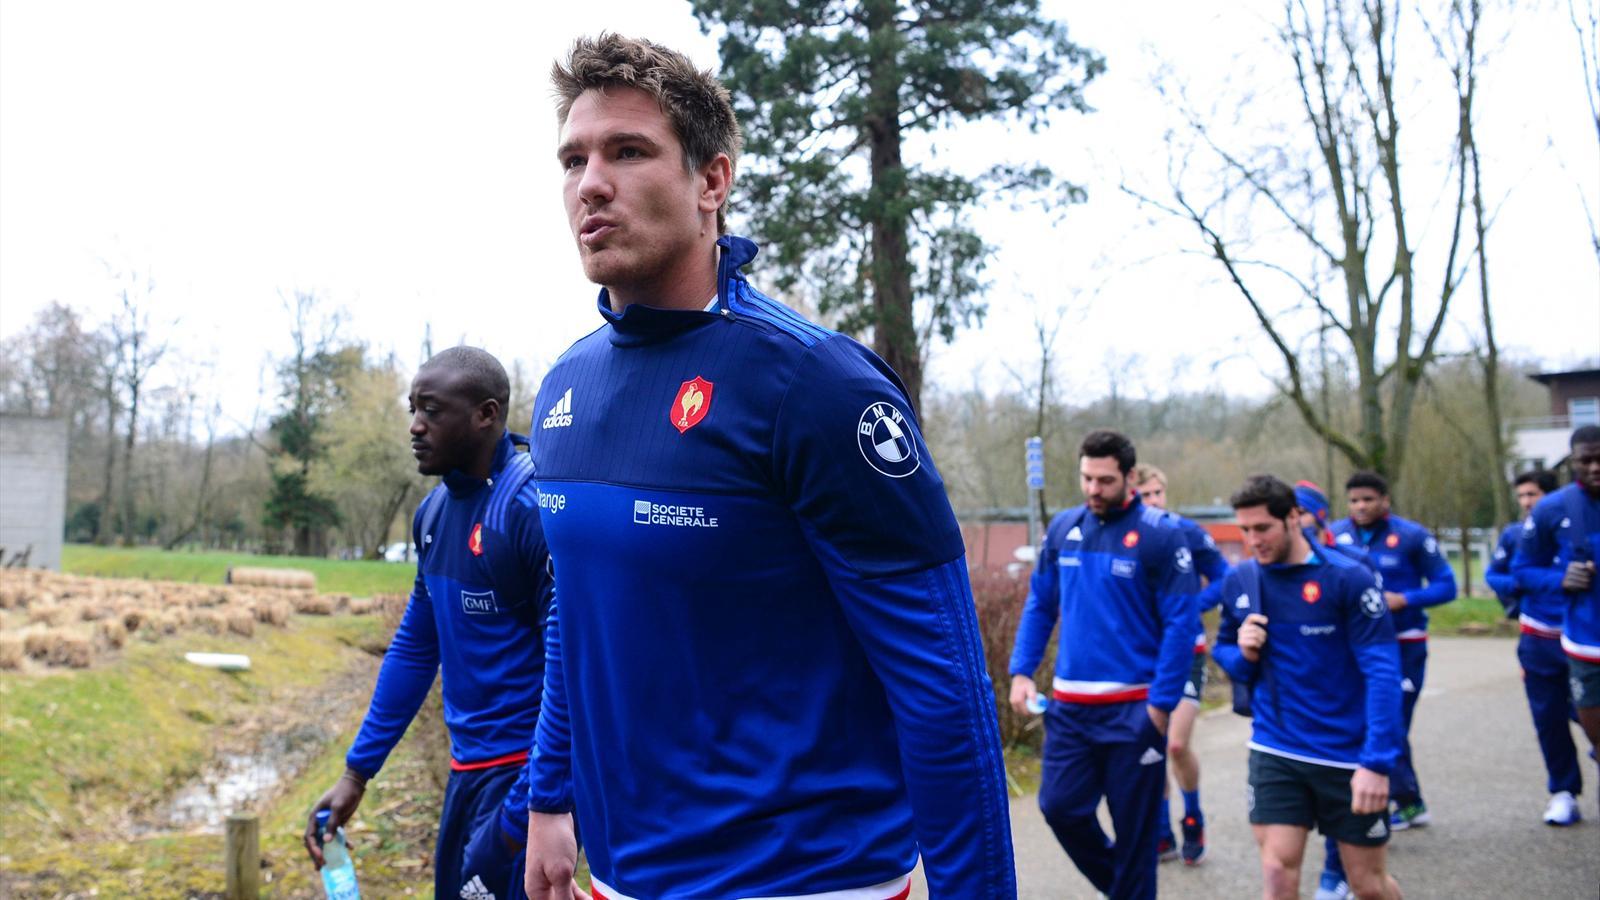 Bernard Le Roux et Djibril Camara (XV de France) - 8 mars 2016